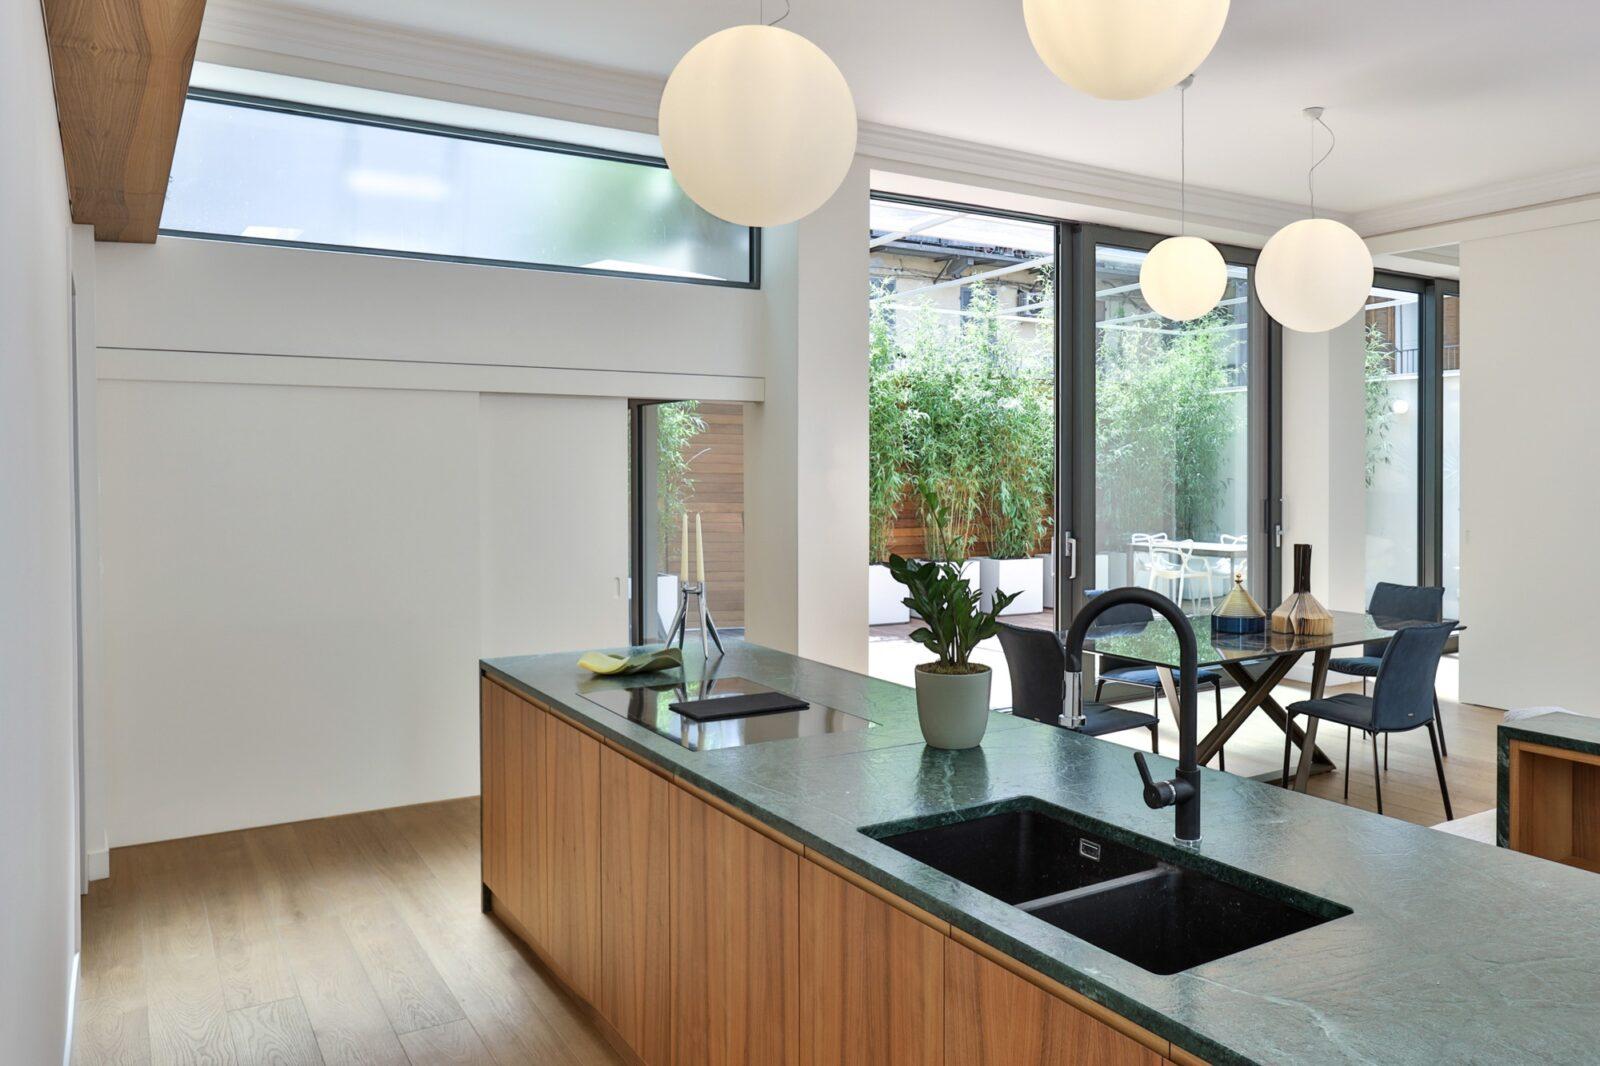 isola cucina moderna con top in marmo verde